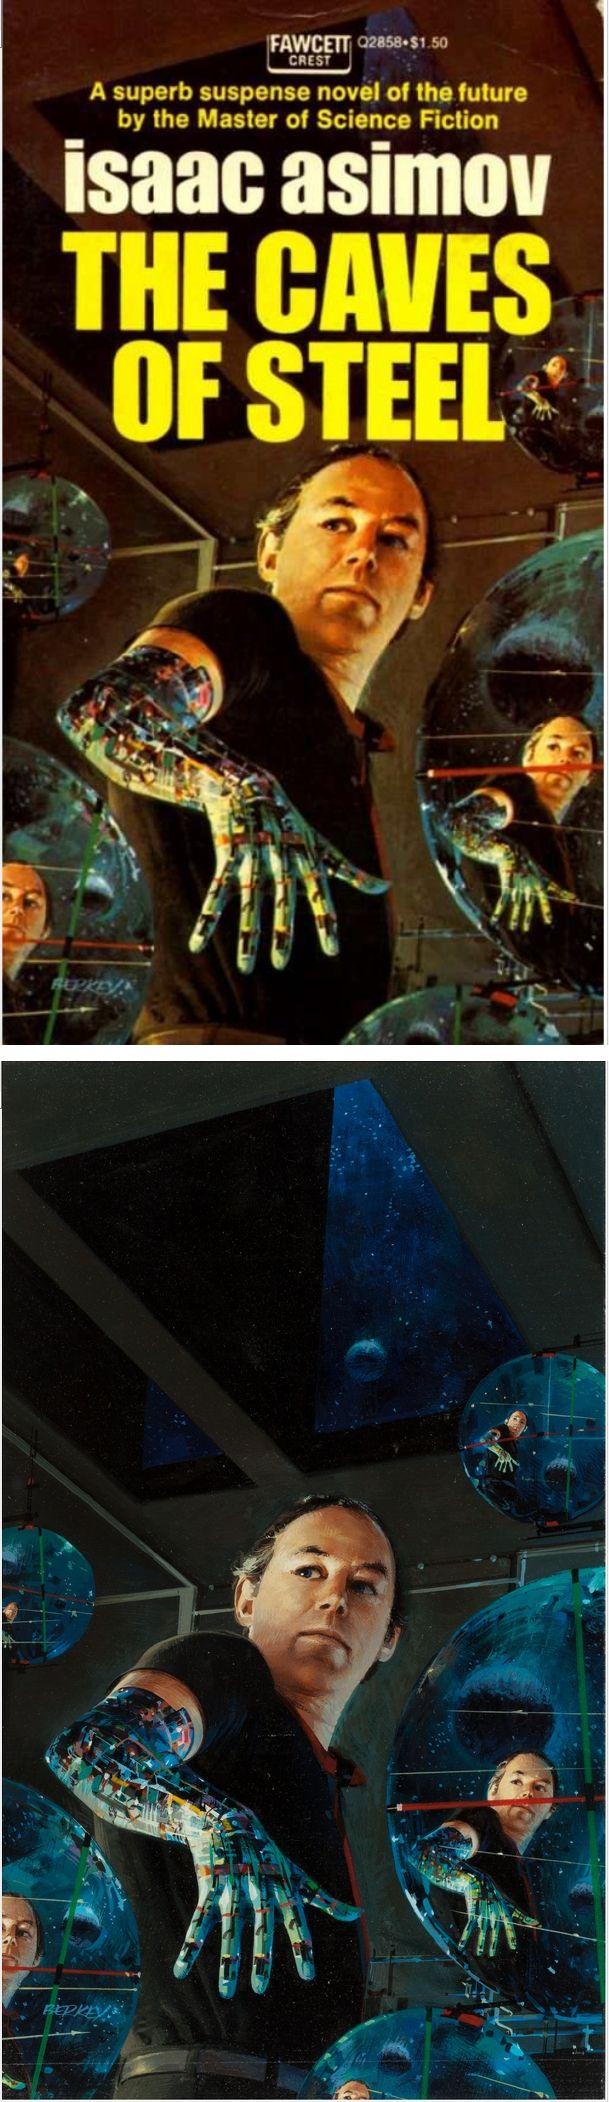 JOHN BERKEY - The Caves of Steel by Isaac Asimov - 1989 Fawcett Books - items by fineart.ha